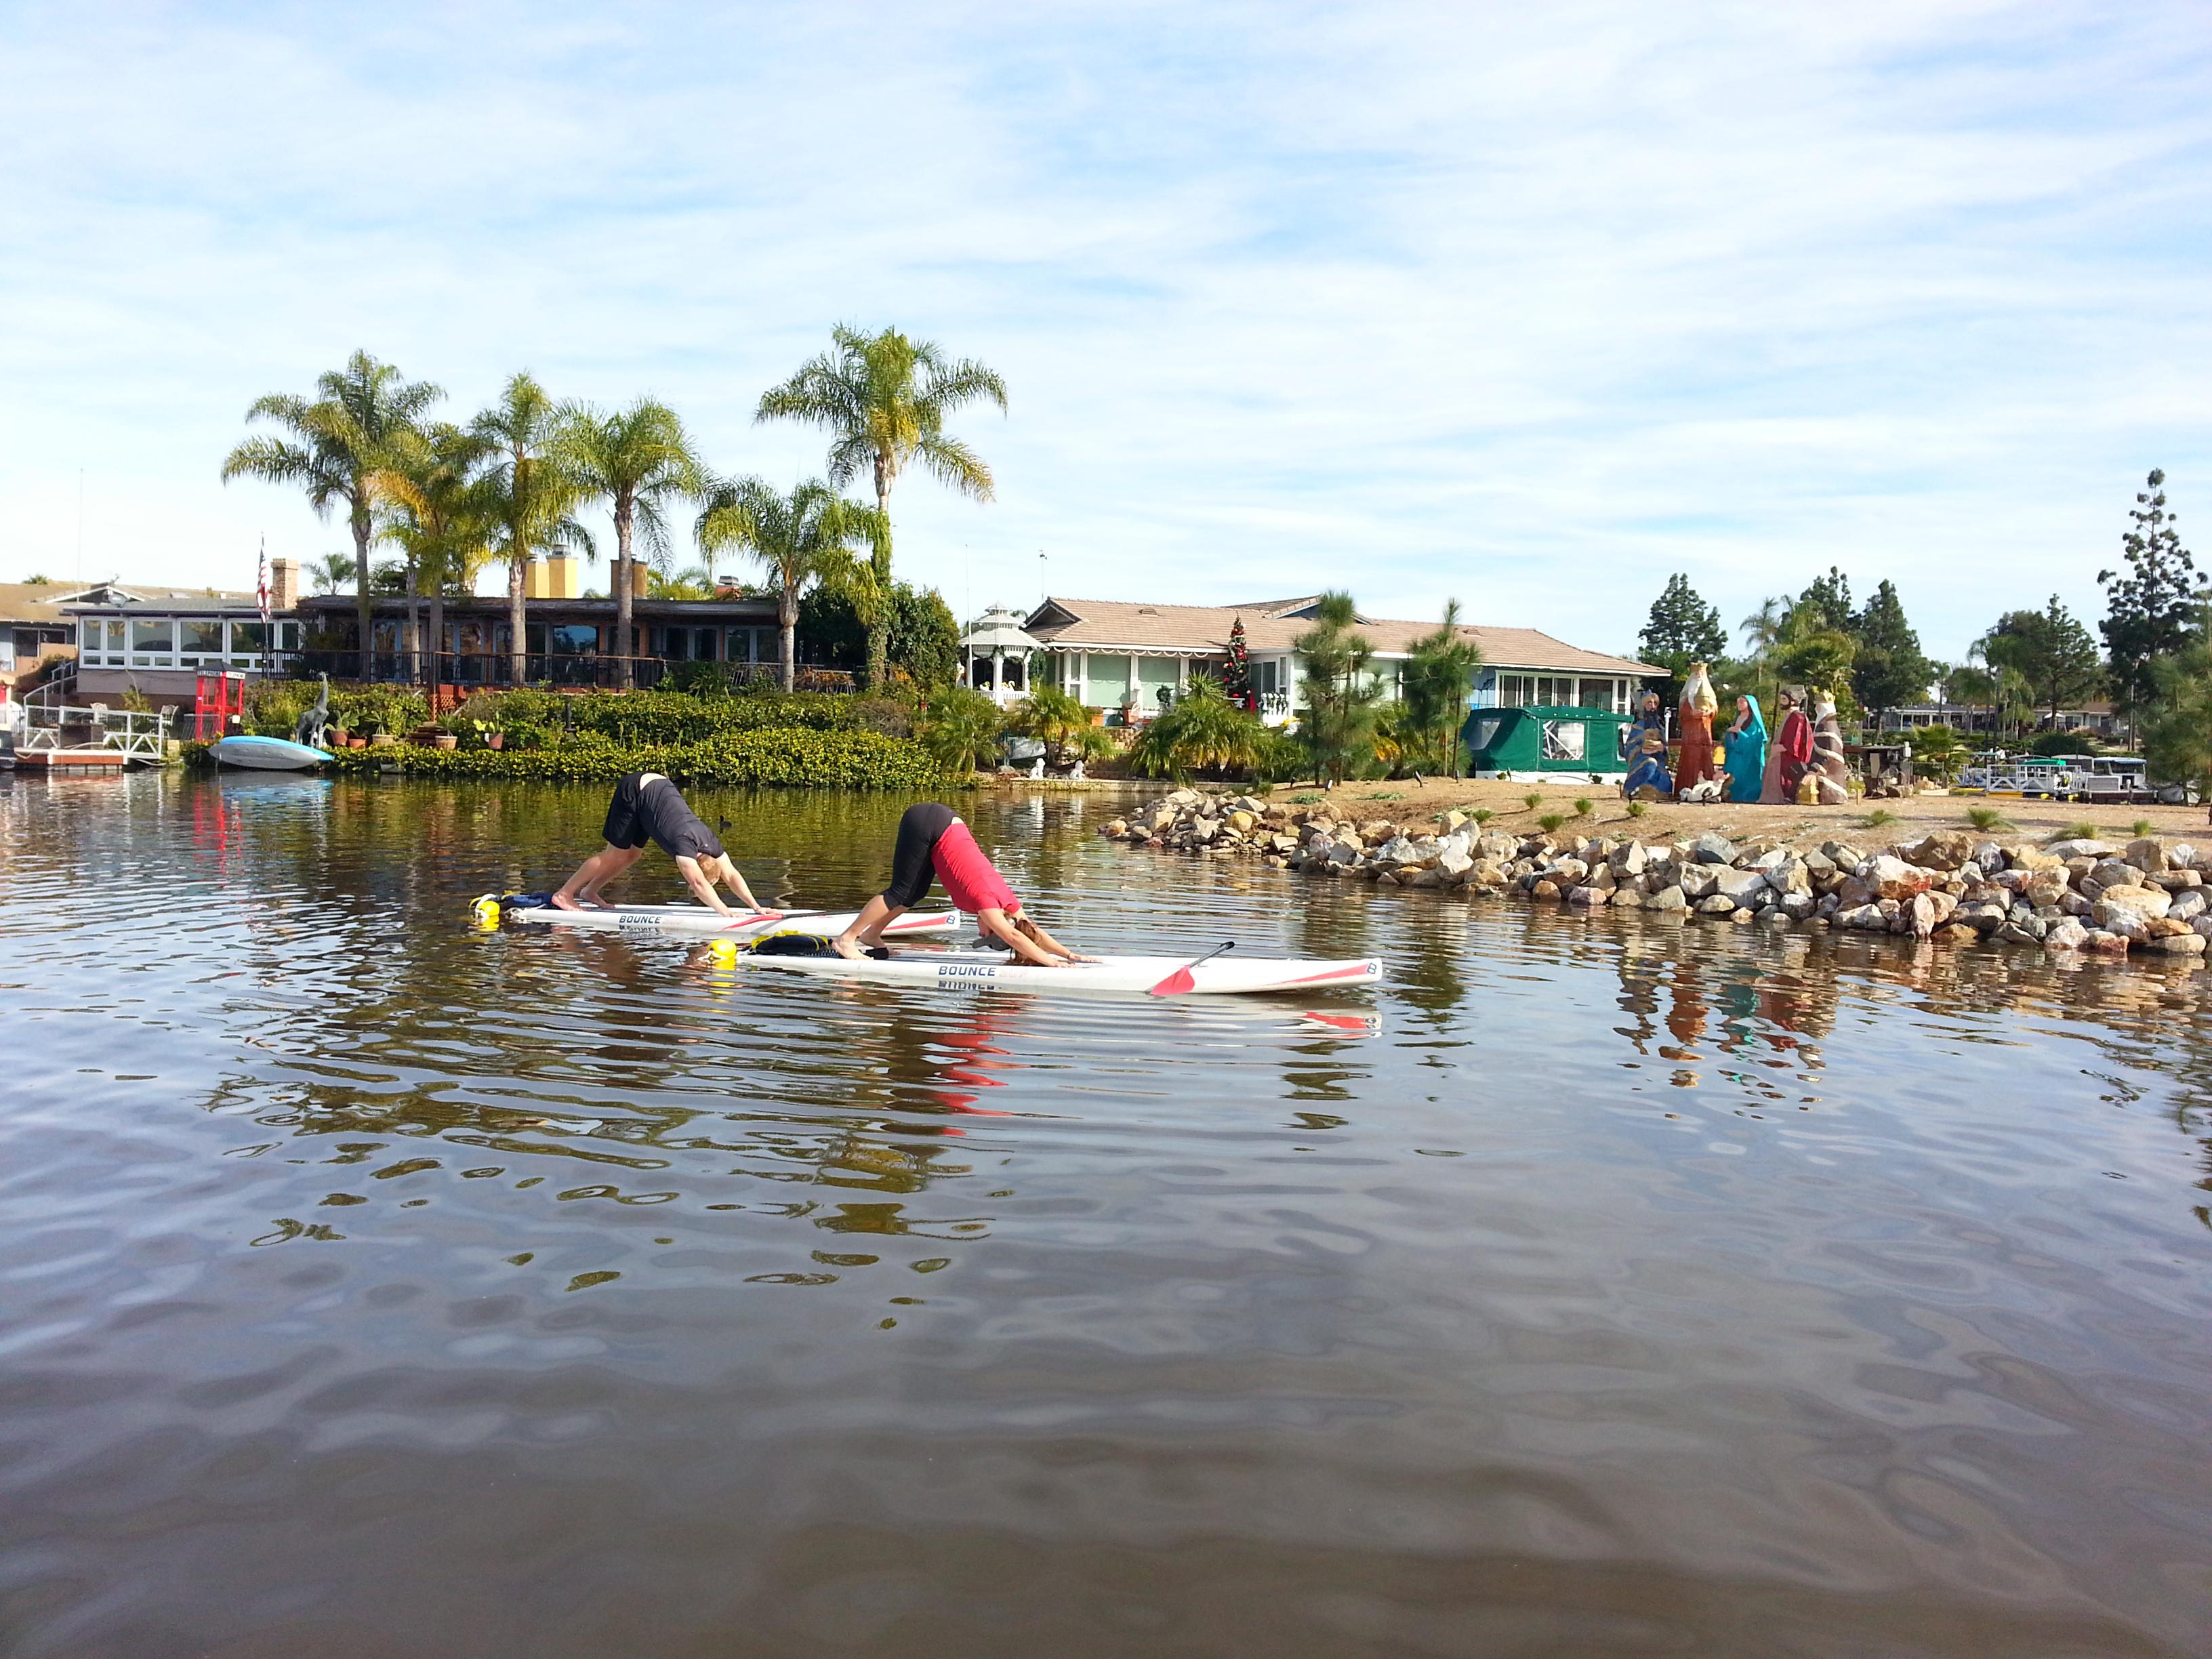 SUP Yoga - Lake San Marcos